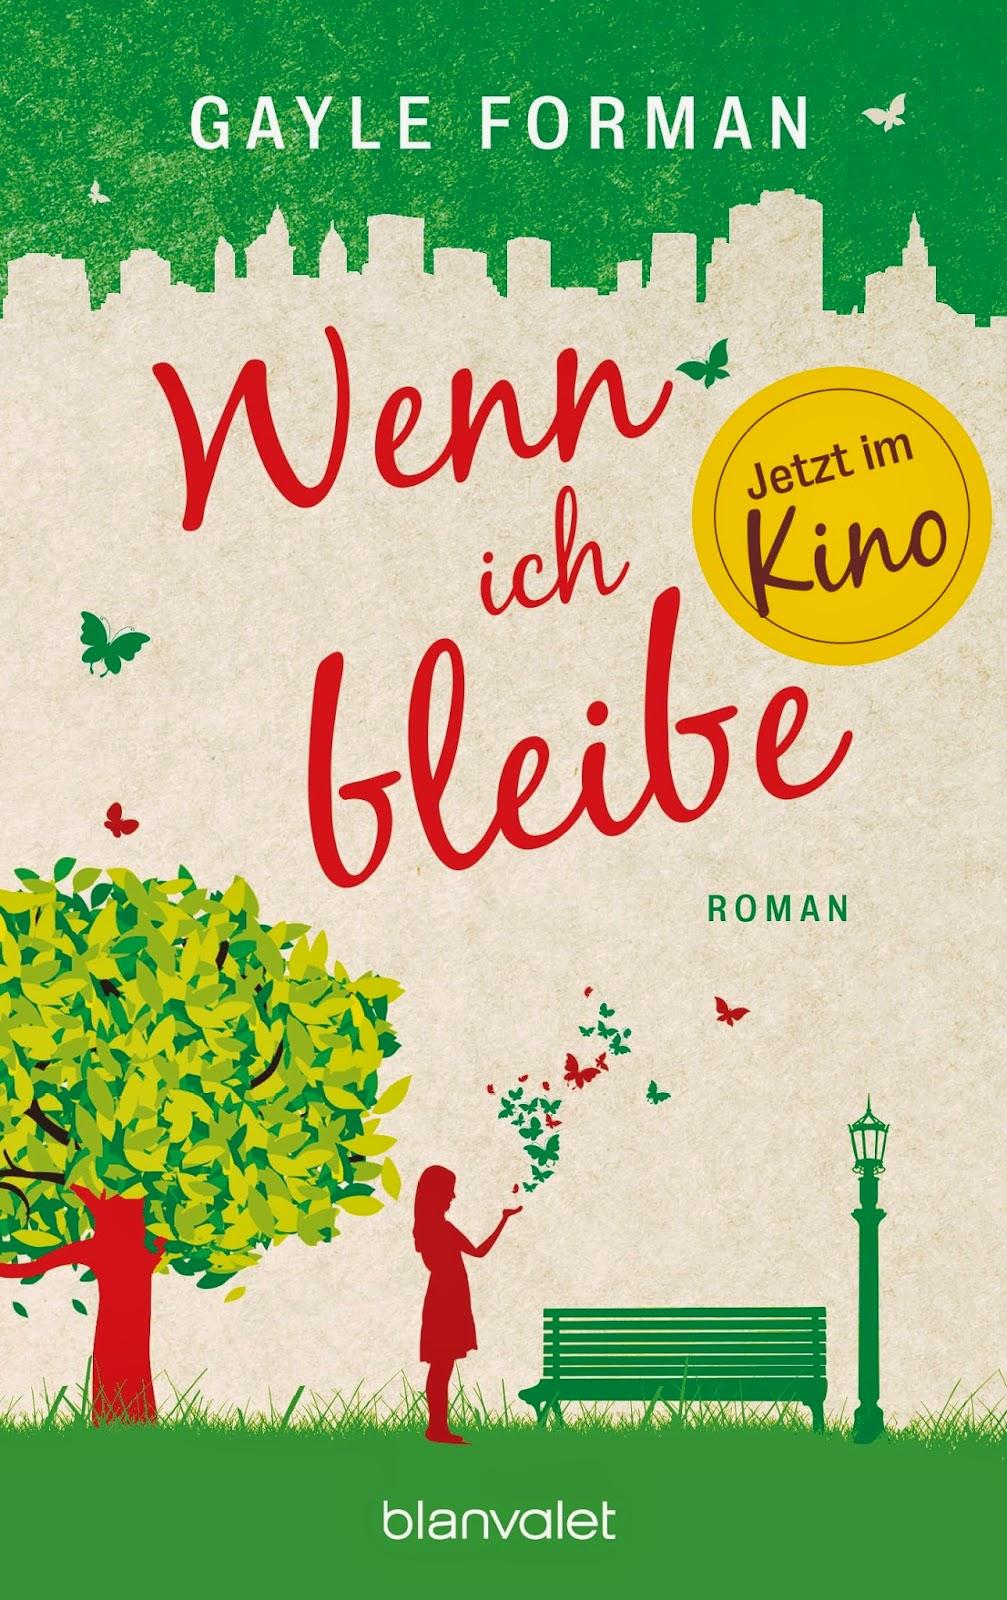 http://www.randomhouse.de/content/edition/covervoila_hires/Forman_GWenn_ich_bleibe_149678.jpg